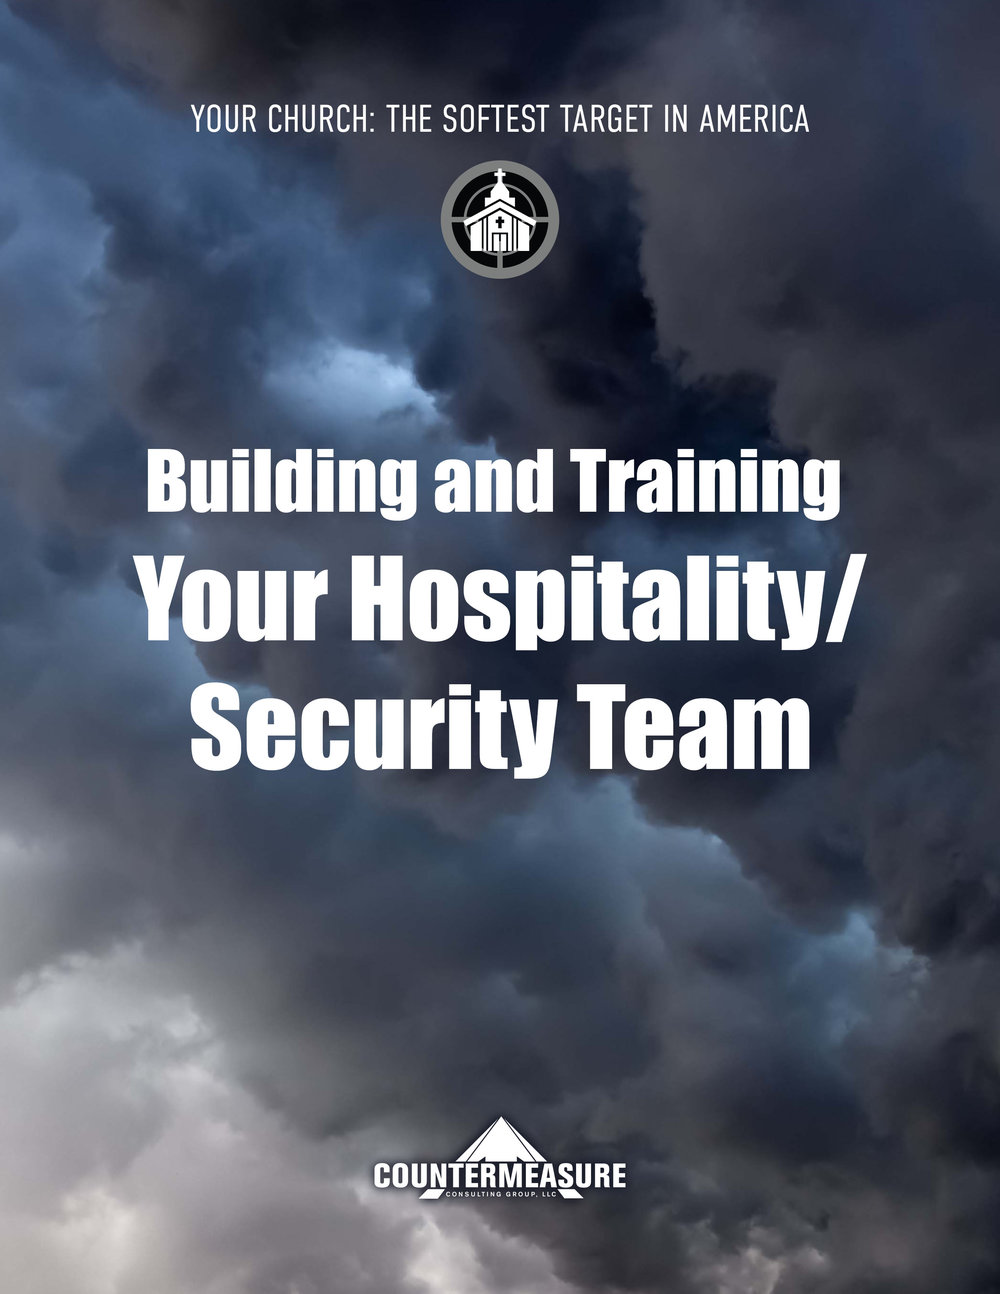 TrainingManual COVER.jpg